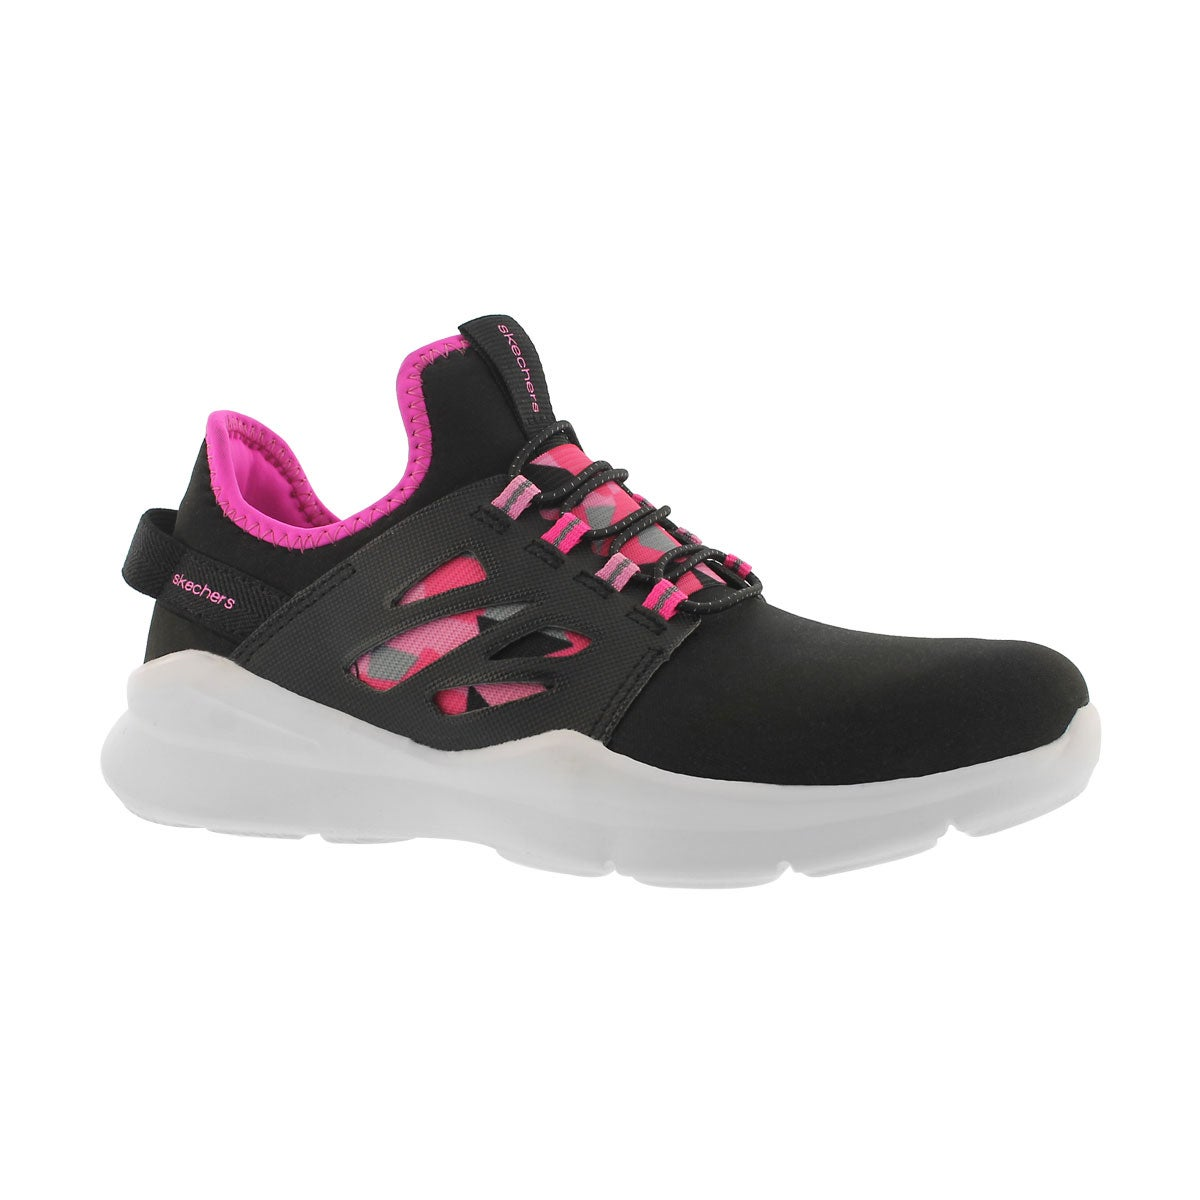 Girls' STREET SQUAD black/pink slip on sneakers